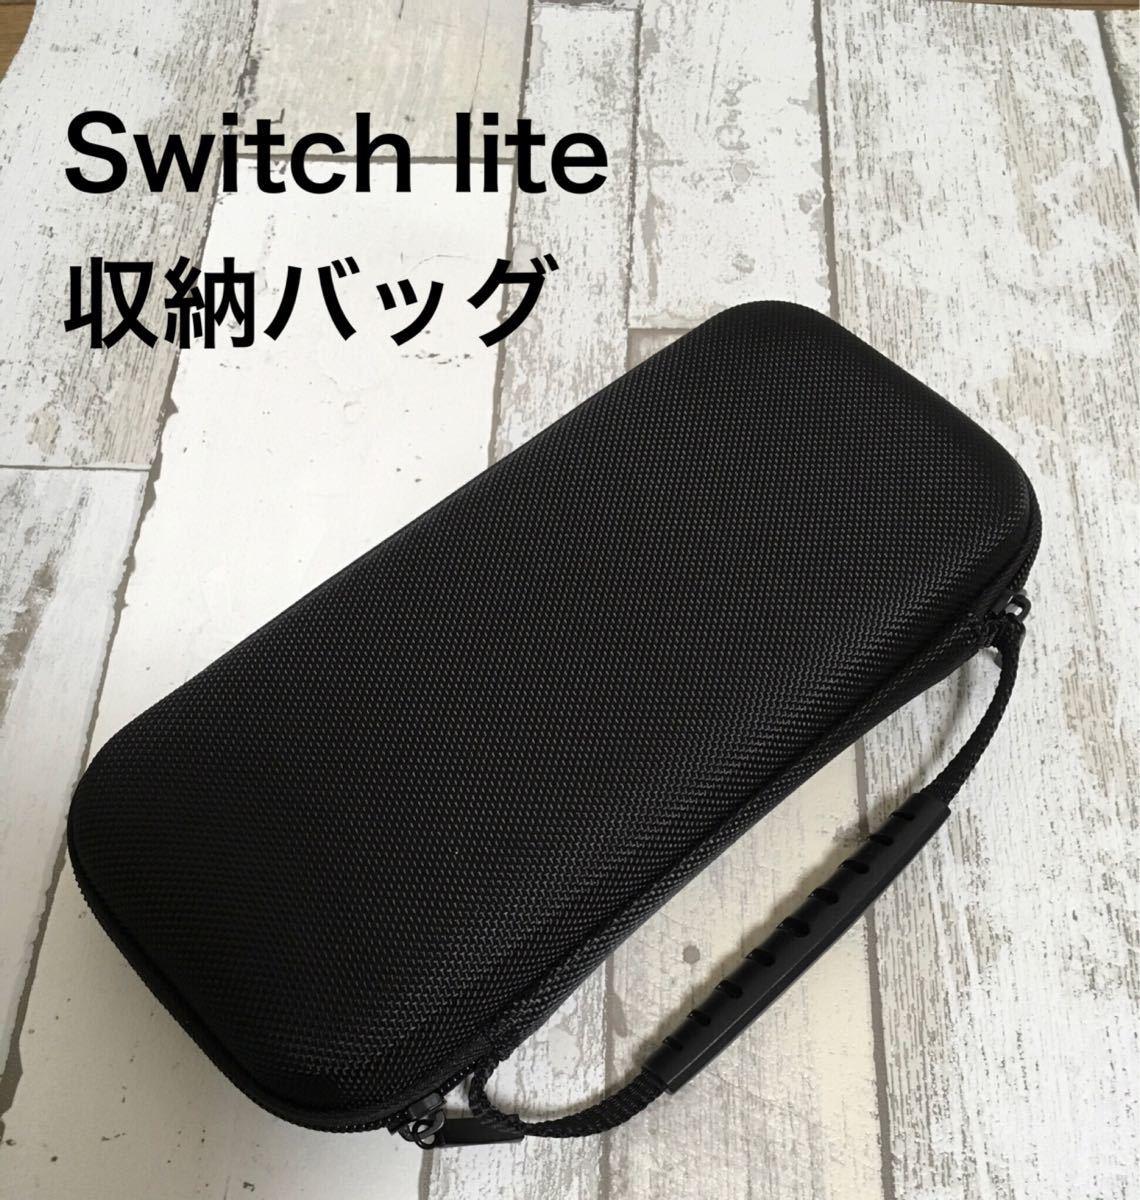 Switch lite スイッチライト ケース 収納バッグ